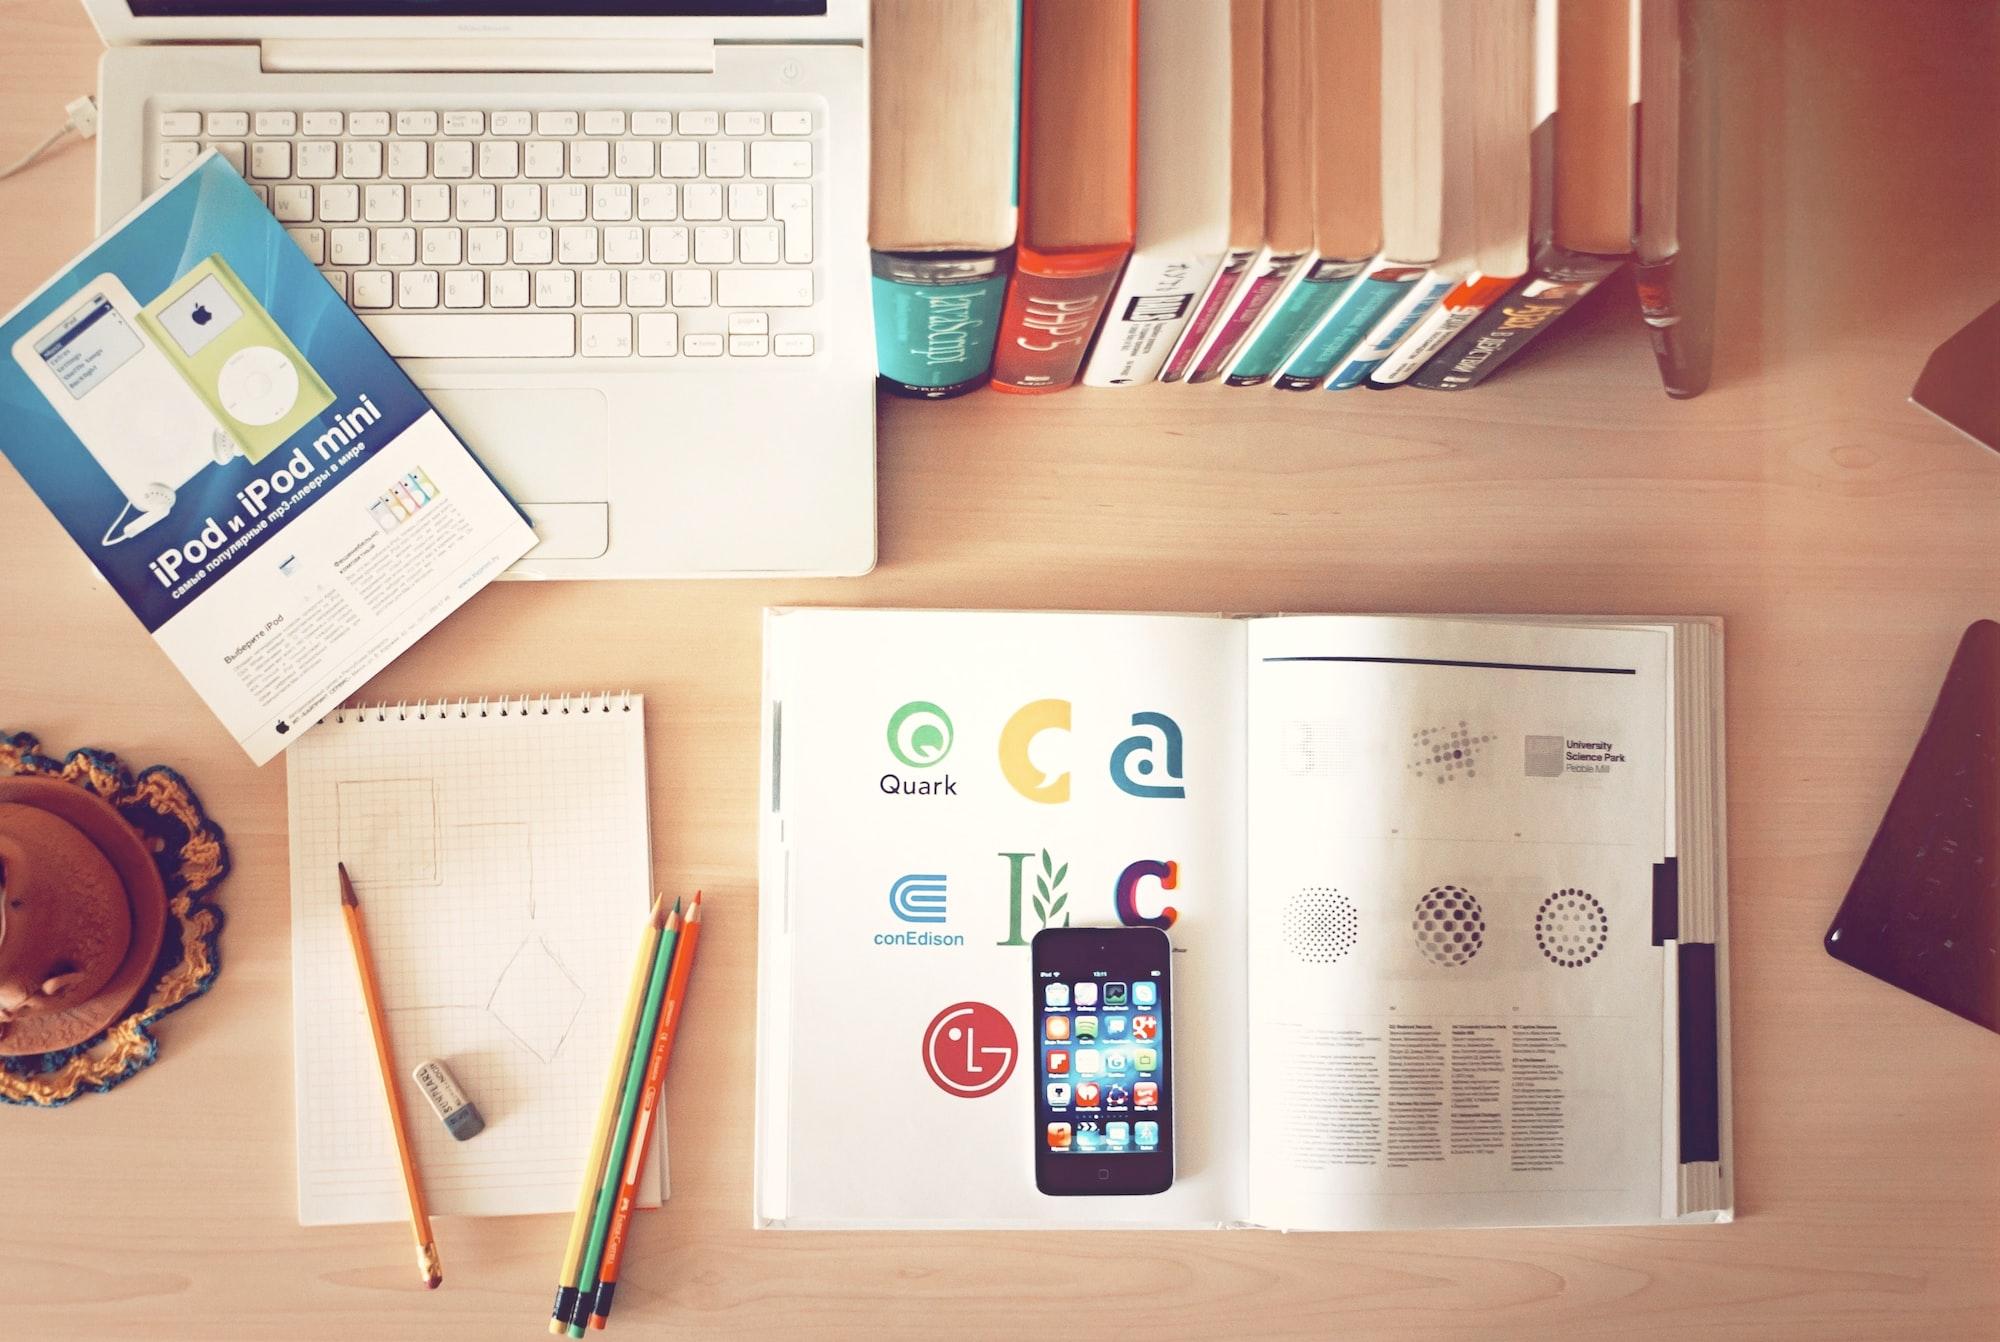 Top view of graphic designer